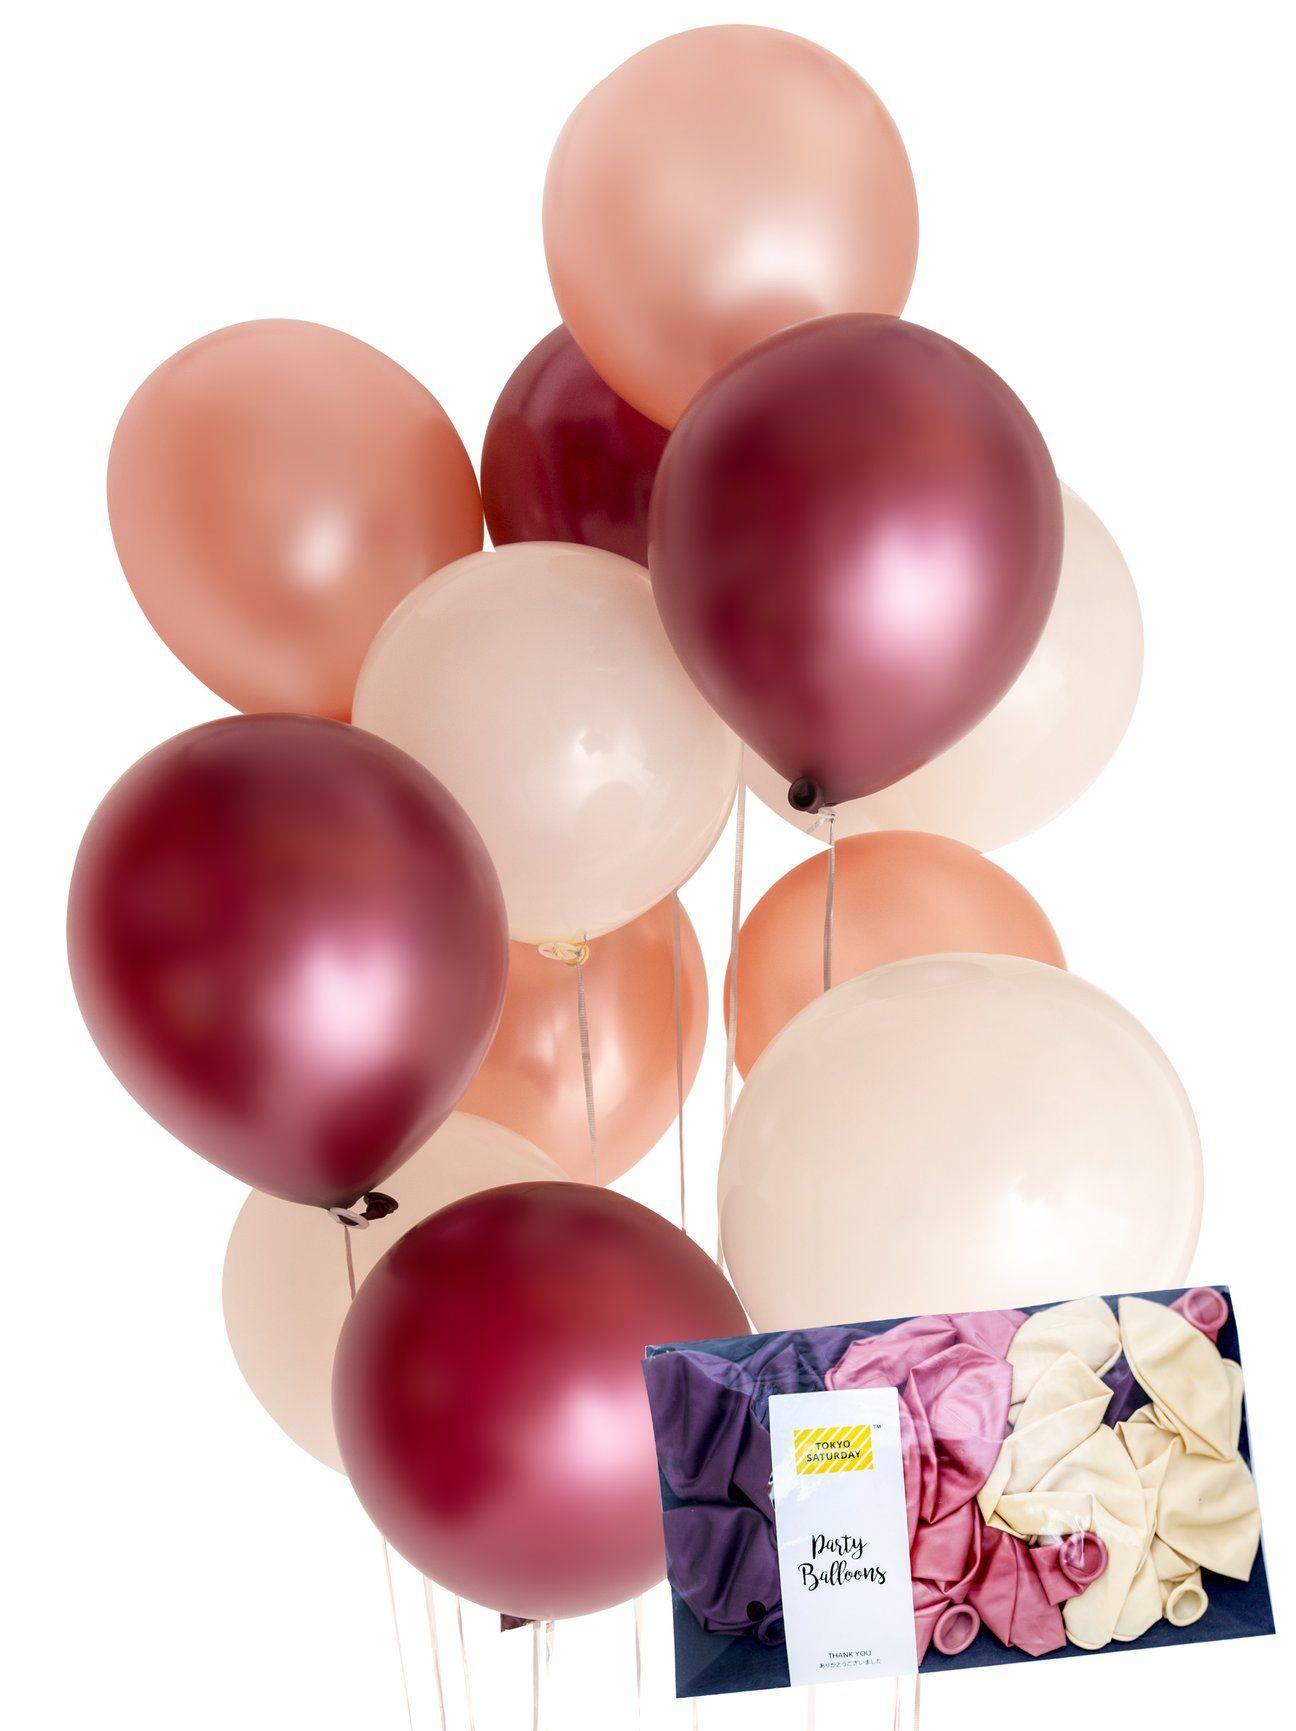 10 to 30 Balloons Metallic Latex Balloons Helium Wedding Party Baloons Ballons